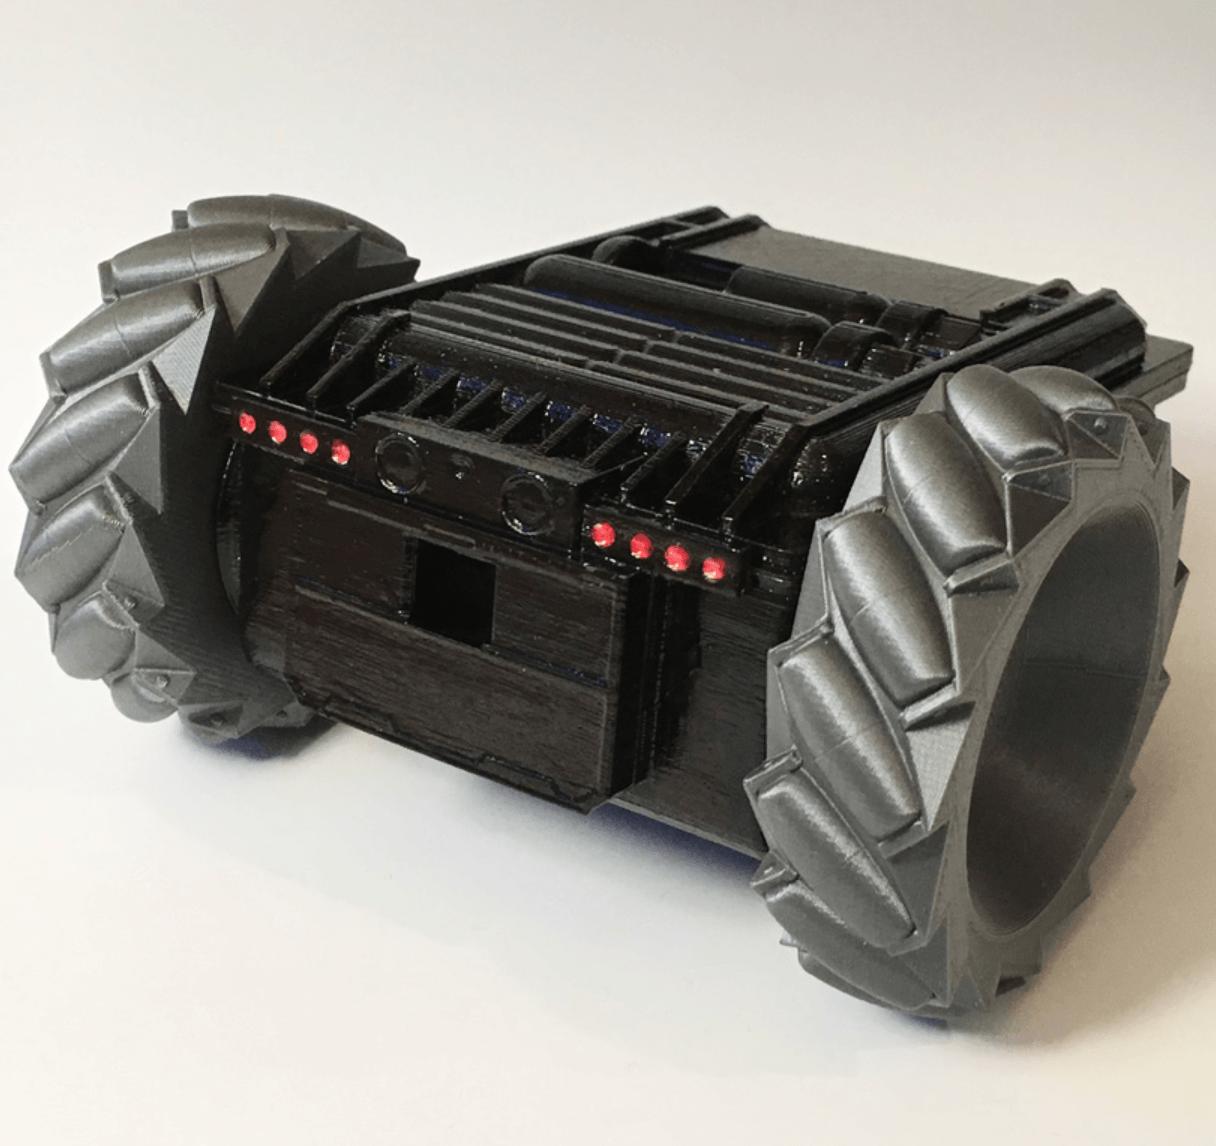 Capture d'écran 2018-04-25 à 09.48.05.png Download free STL file Twitch Drone Chassis for ZeroBot • 3D printable template, MaxMKA